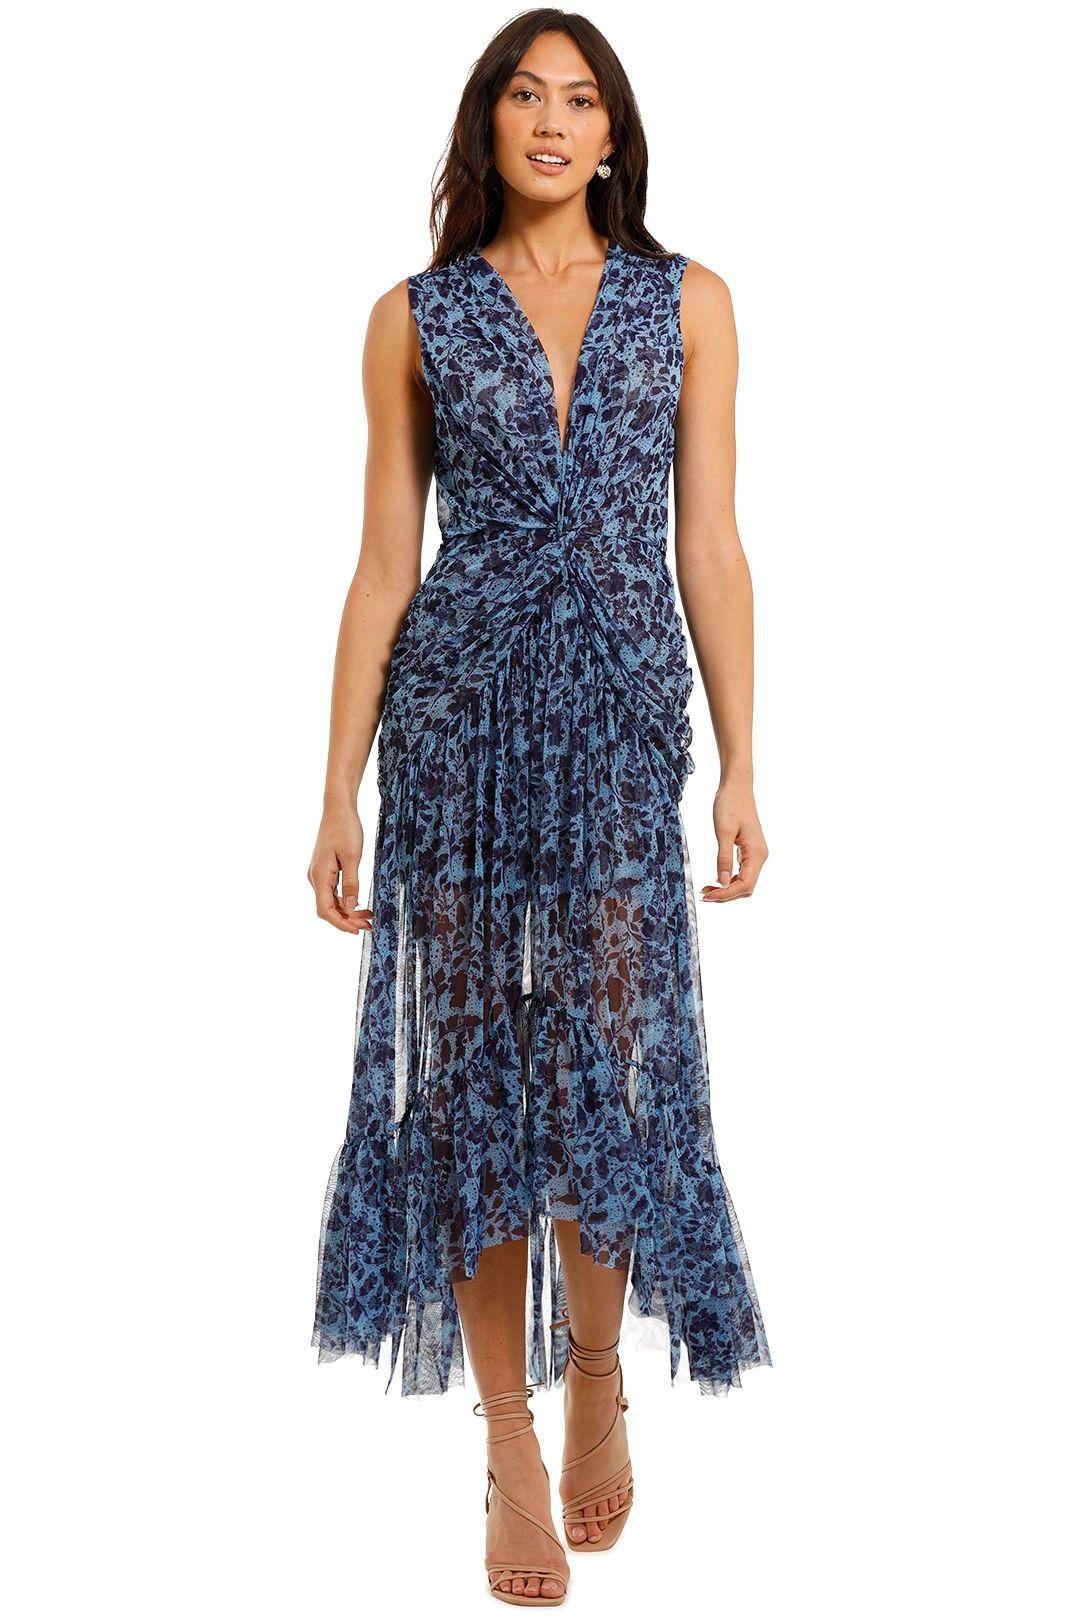 Misa LA Ava Dress Blue Print